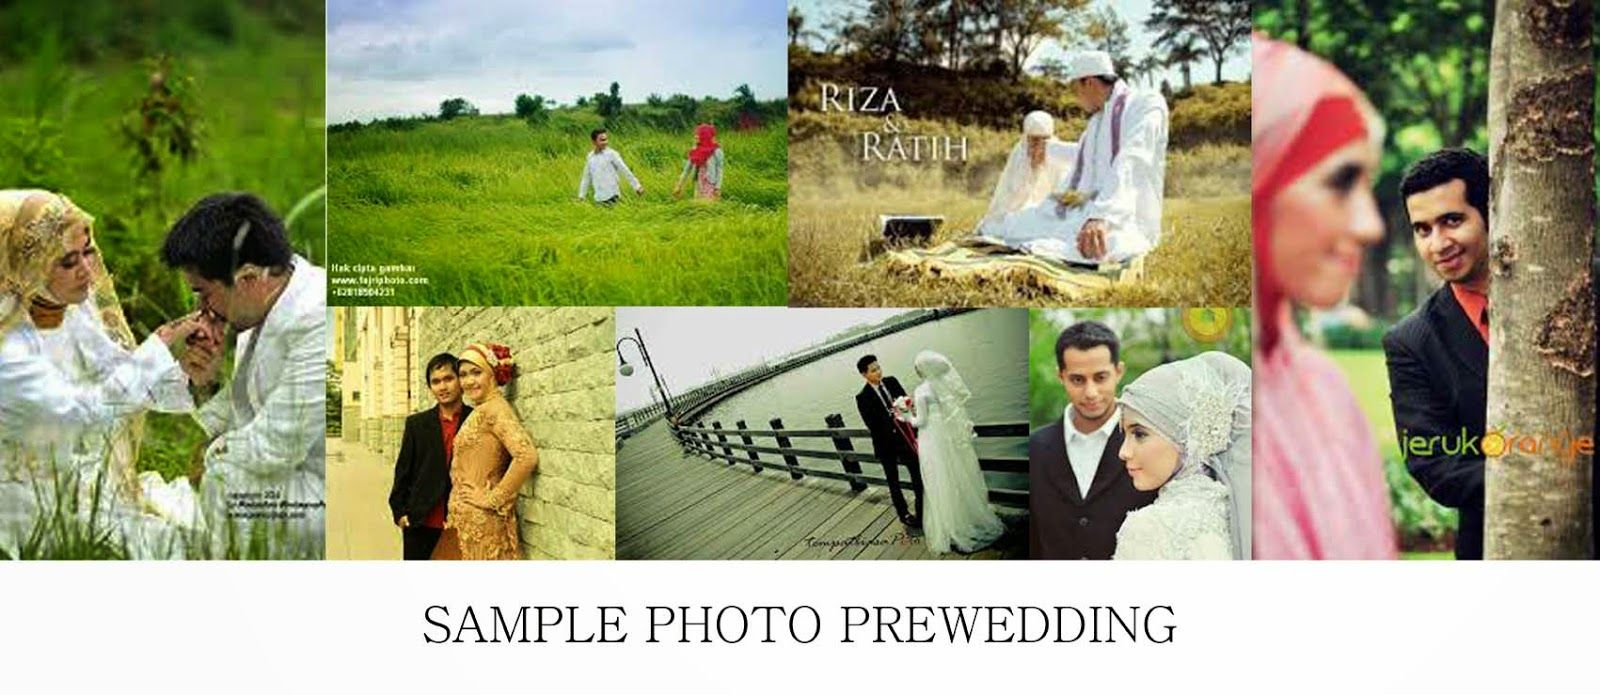 Foto Prewedding Wanita Berjilbab Kumpulan Gambar Pre Wedding Contoh